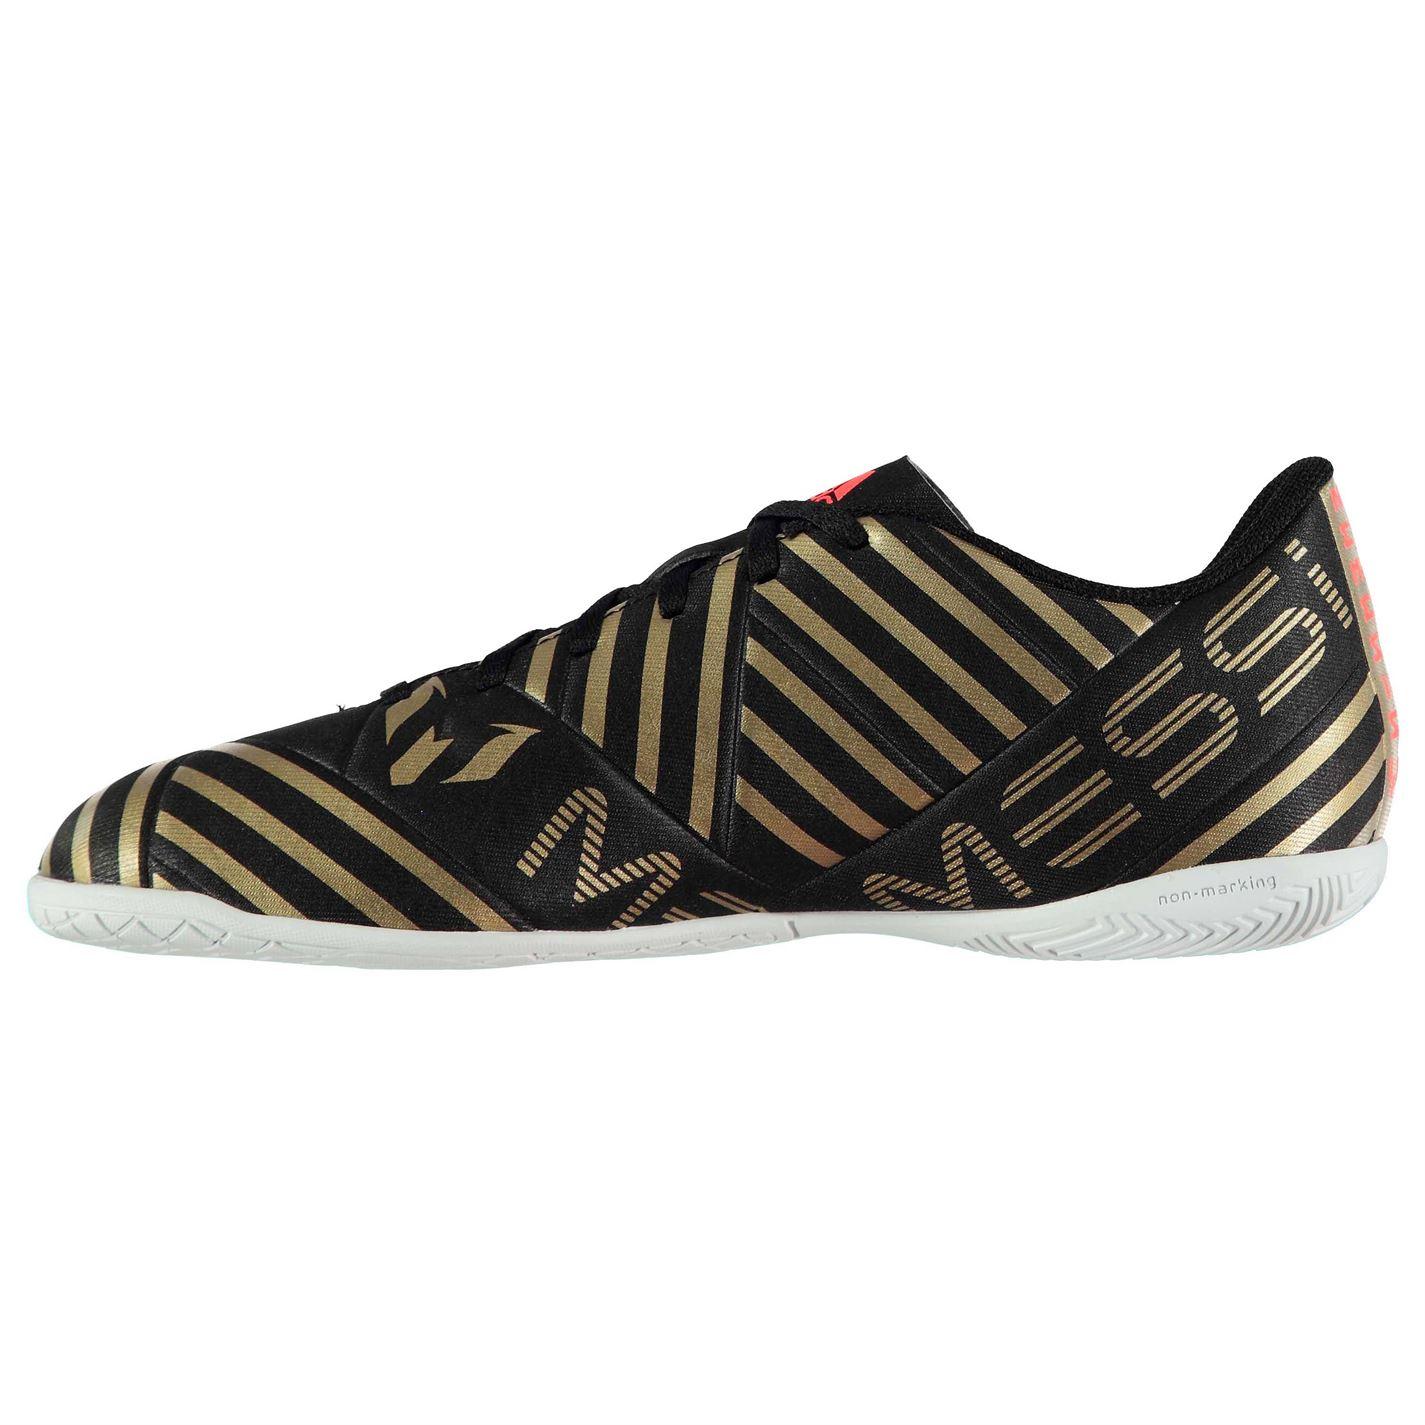 7ecabe202b96 adidas Nemeziz Messi Tango 17.4 Indoor Football Sneakers Mens Gents Boots  Laces 4 4 sur 4 Voir Plus